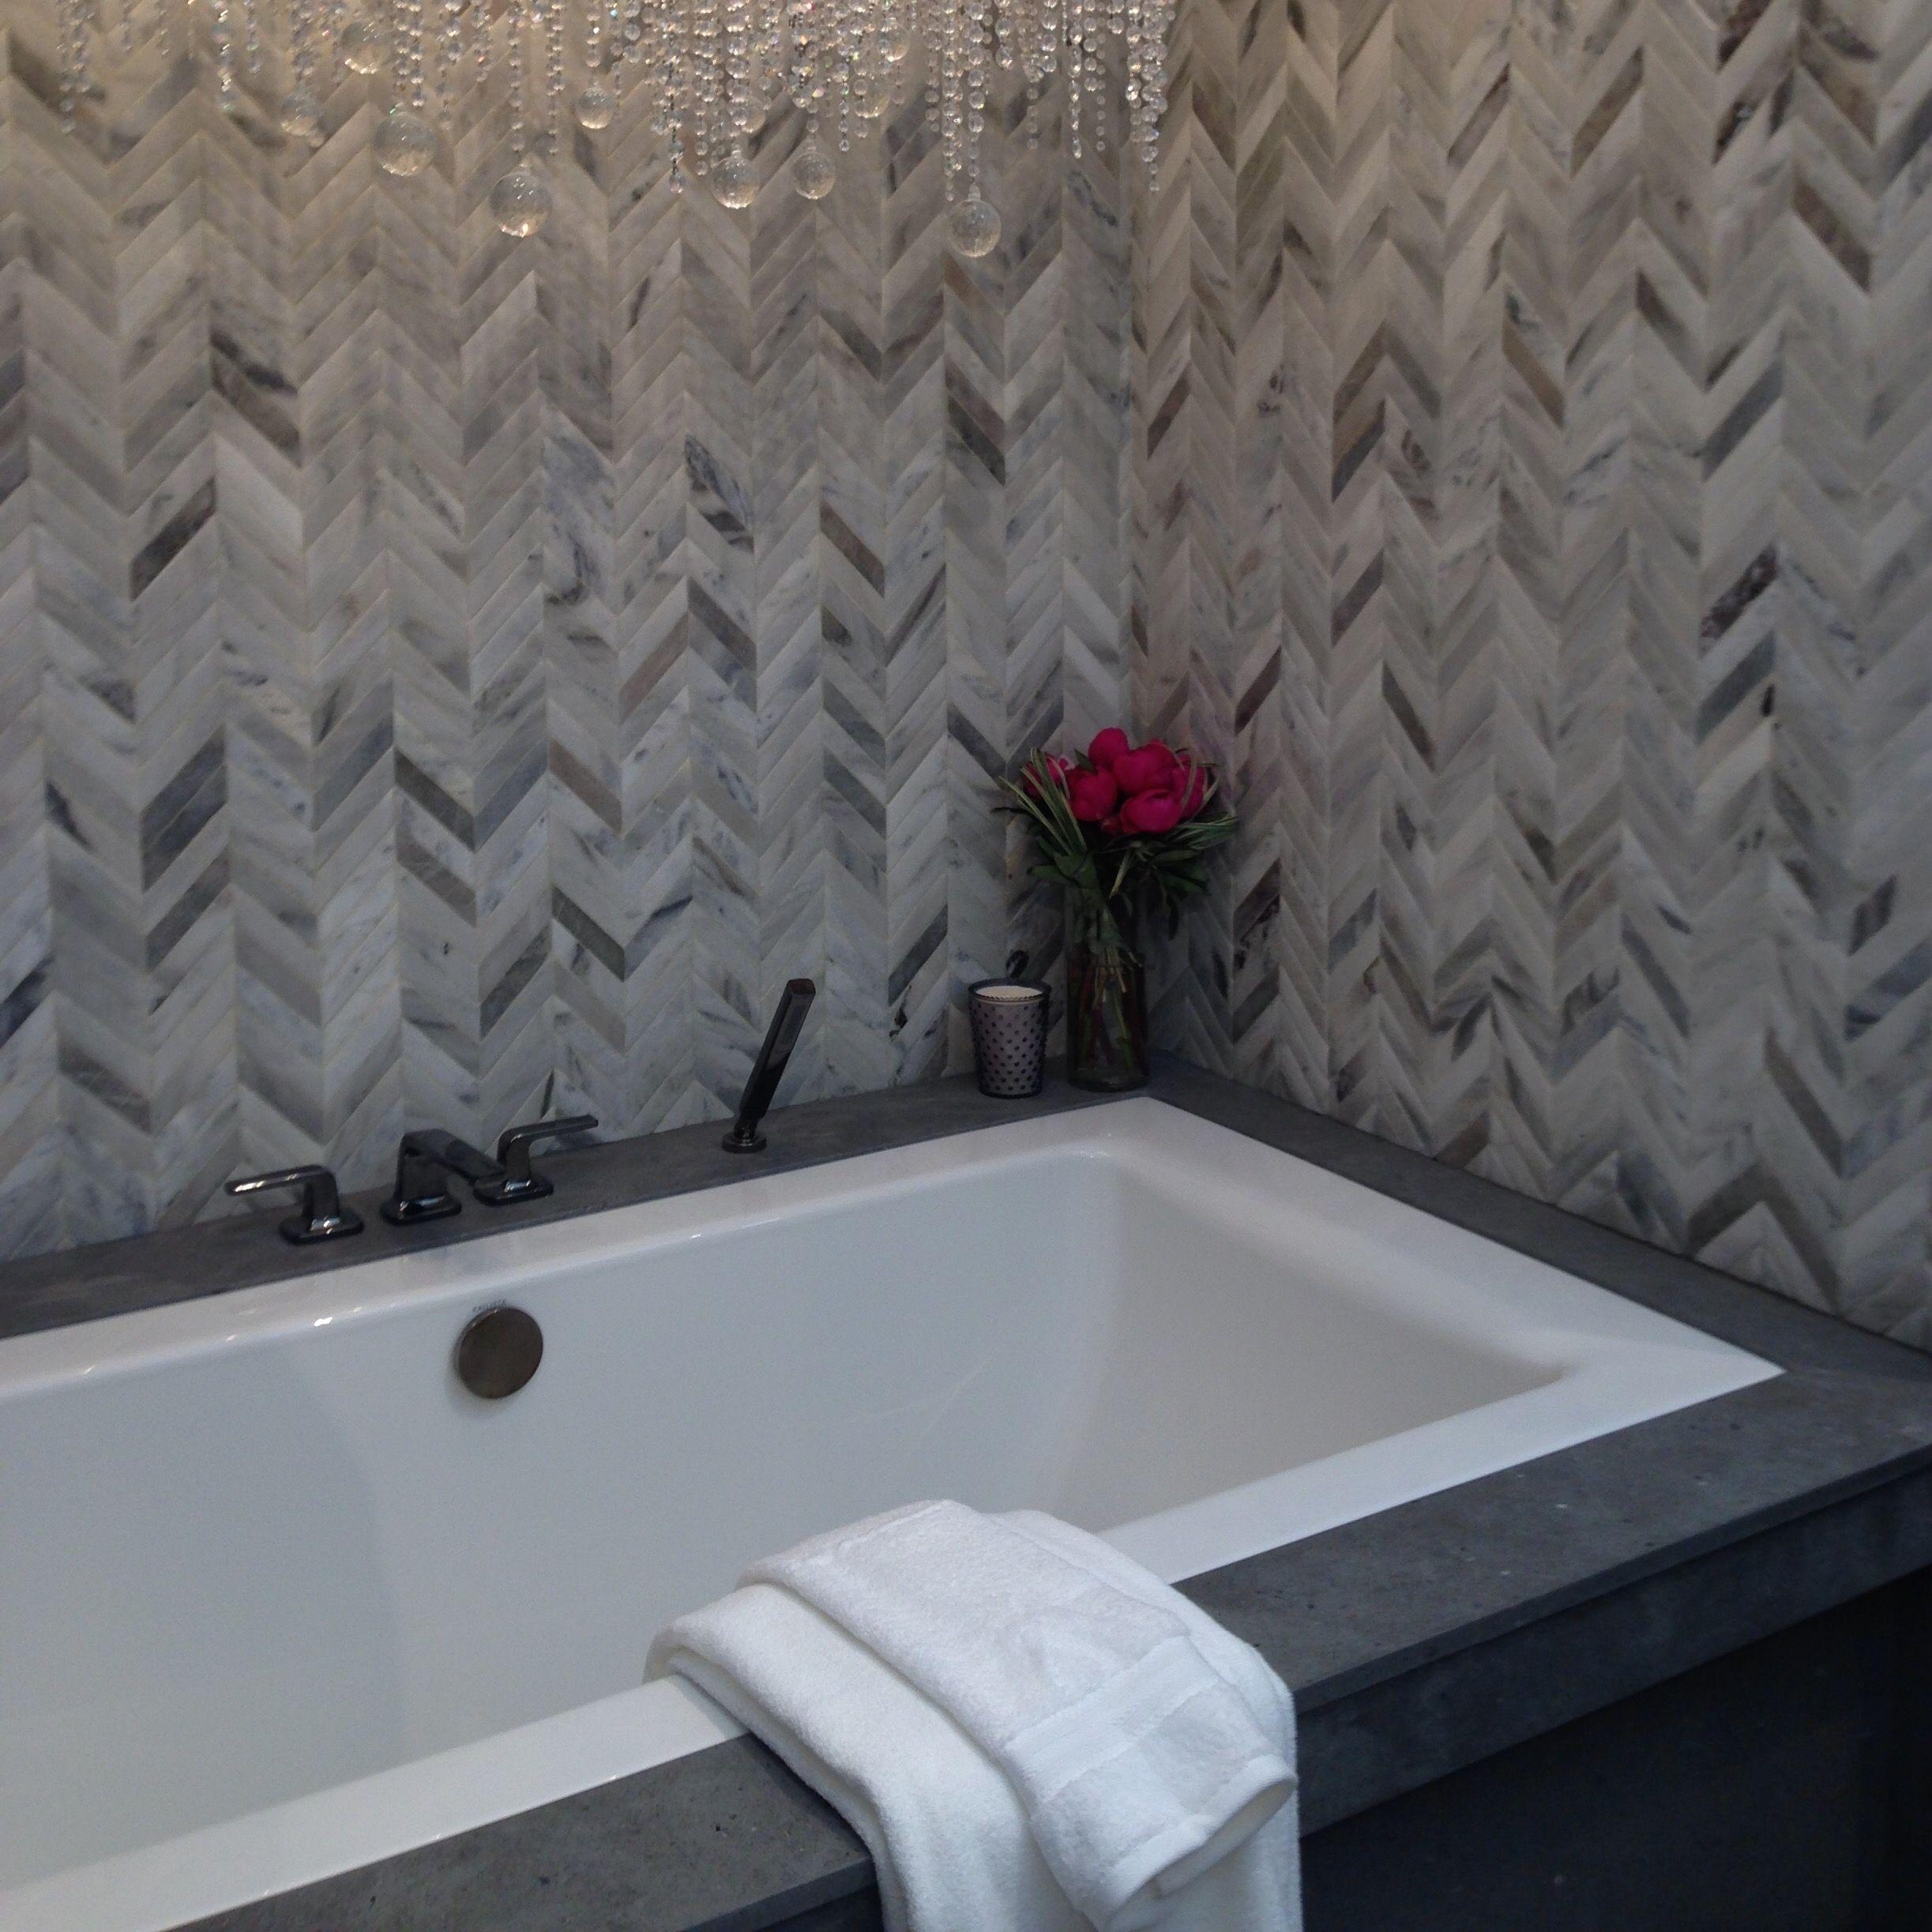 chevron jacuzzi bathtub backsplash | first house | Pinterest ...